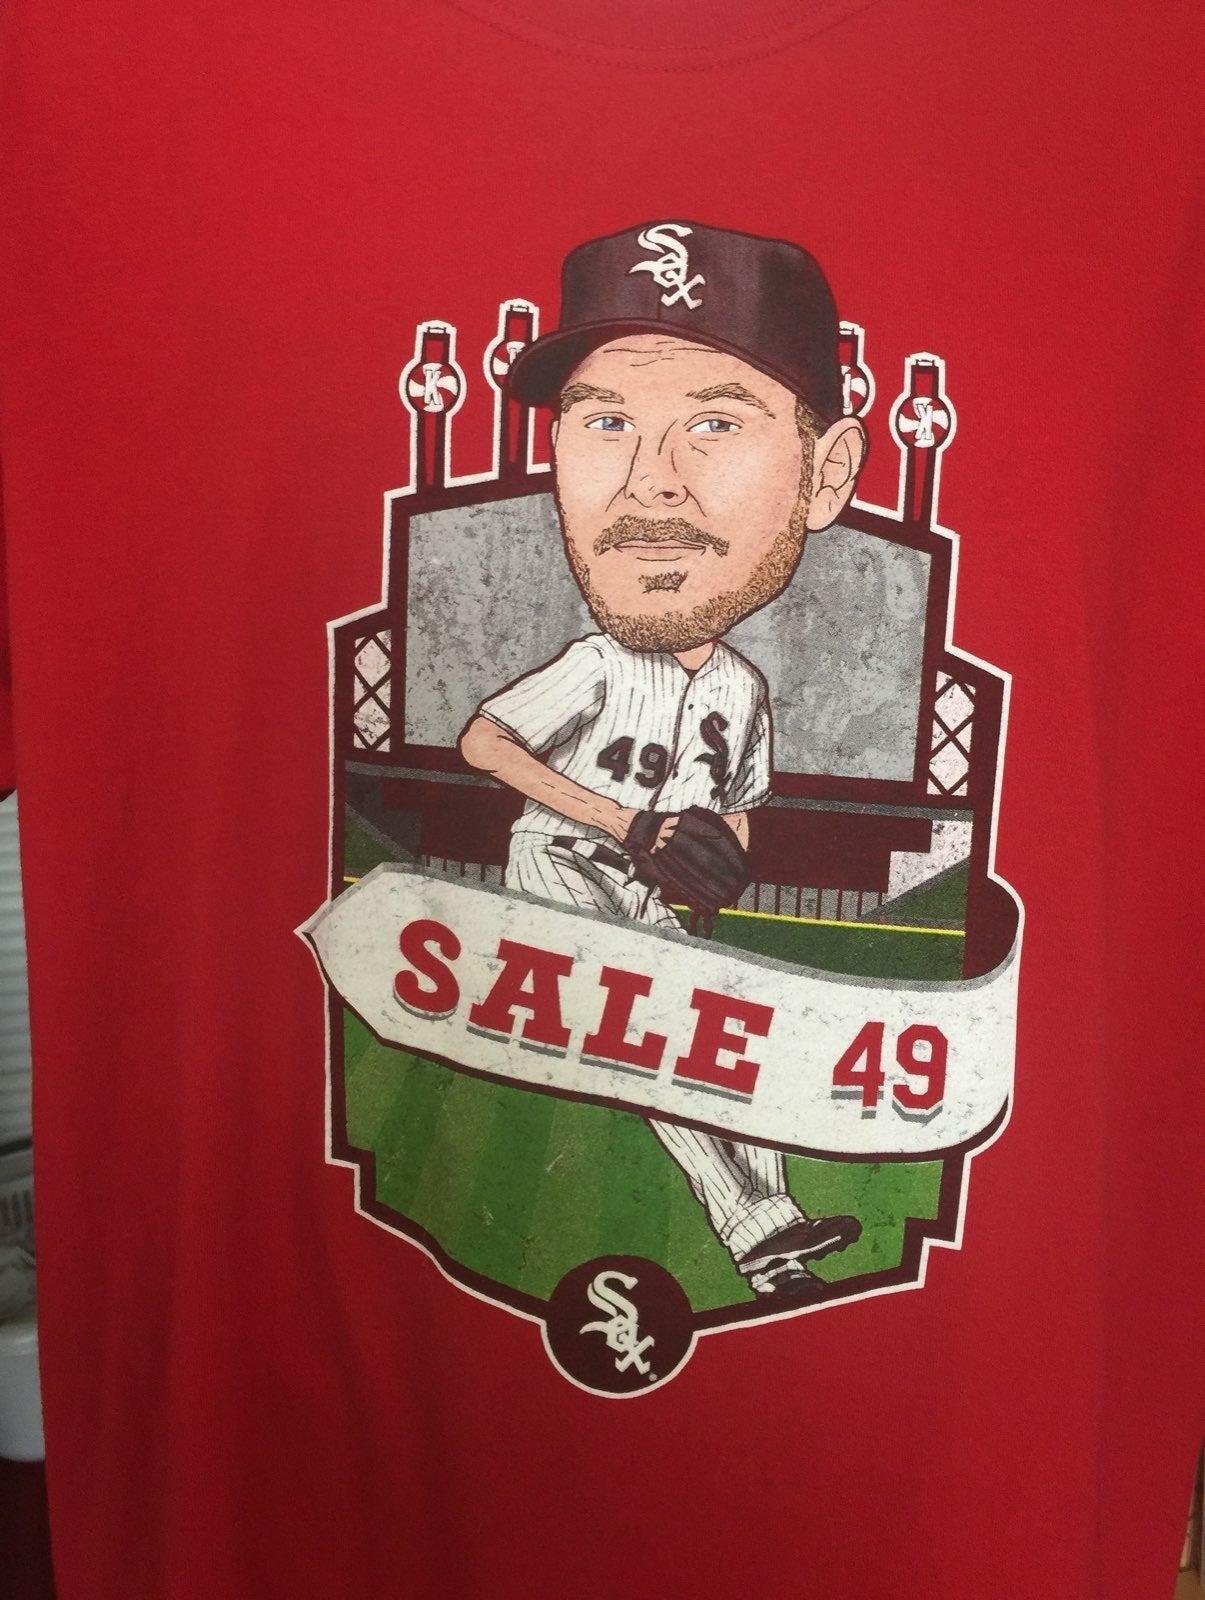 KC Red Sox. Sale 49 tee shirt